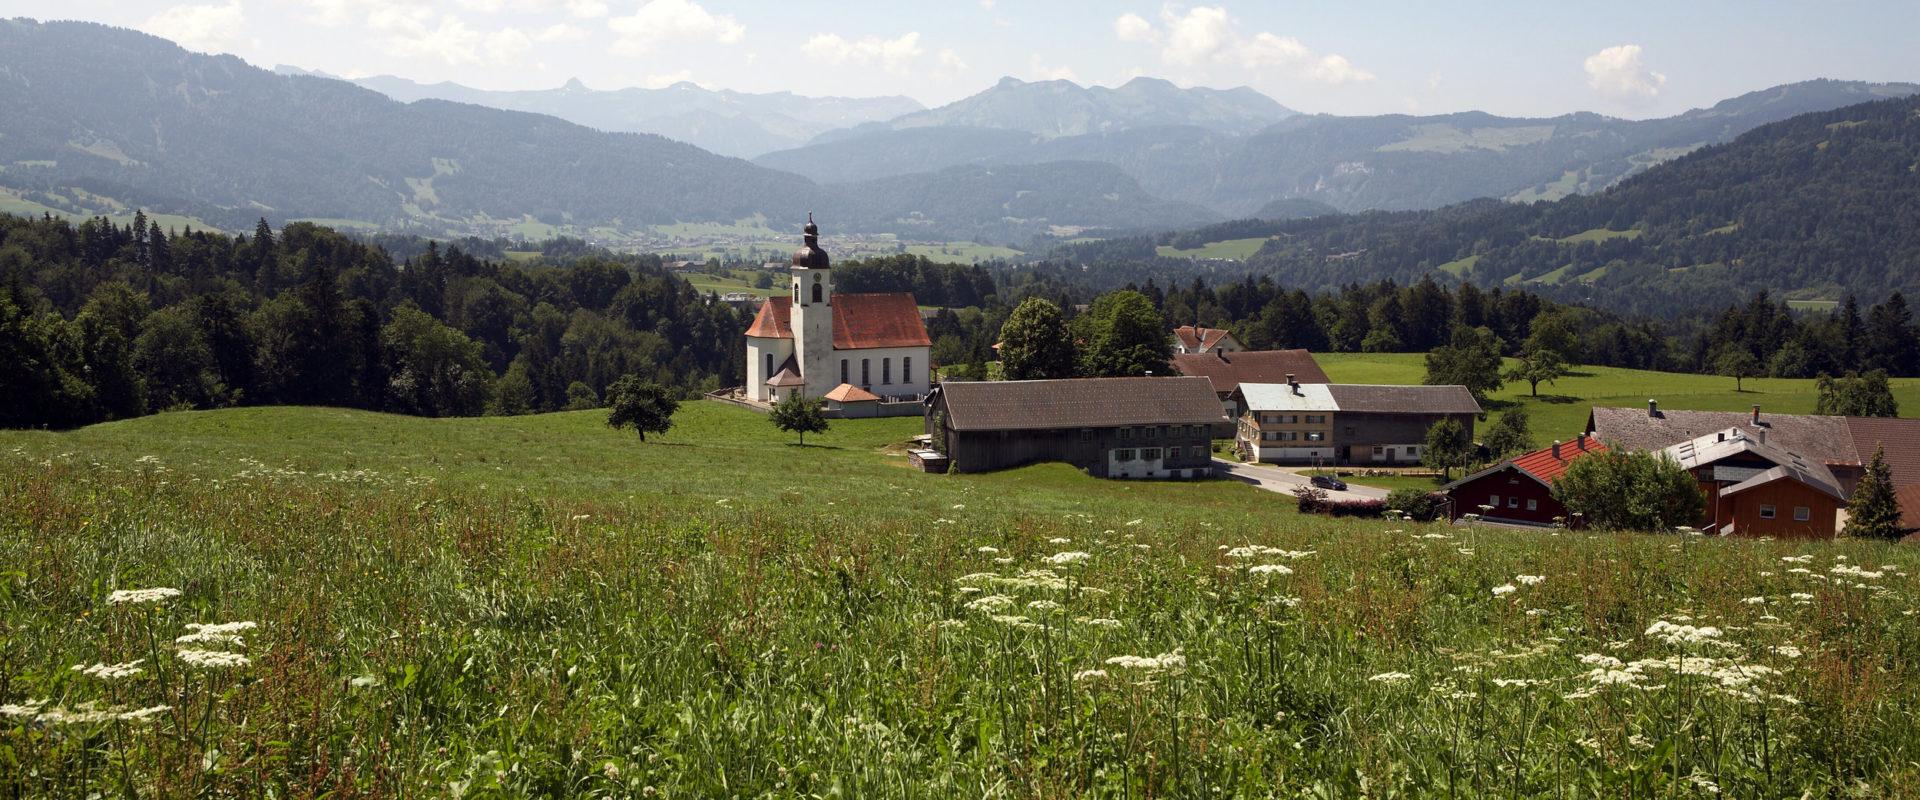 Langenegg © Christoph Lingg / Bregenzerwald Tourismus